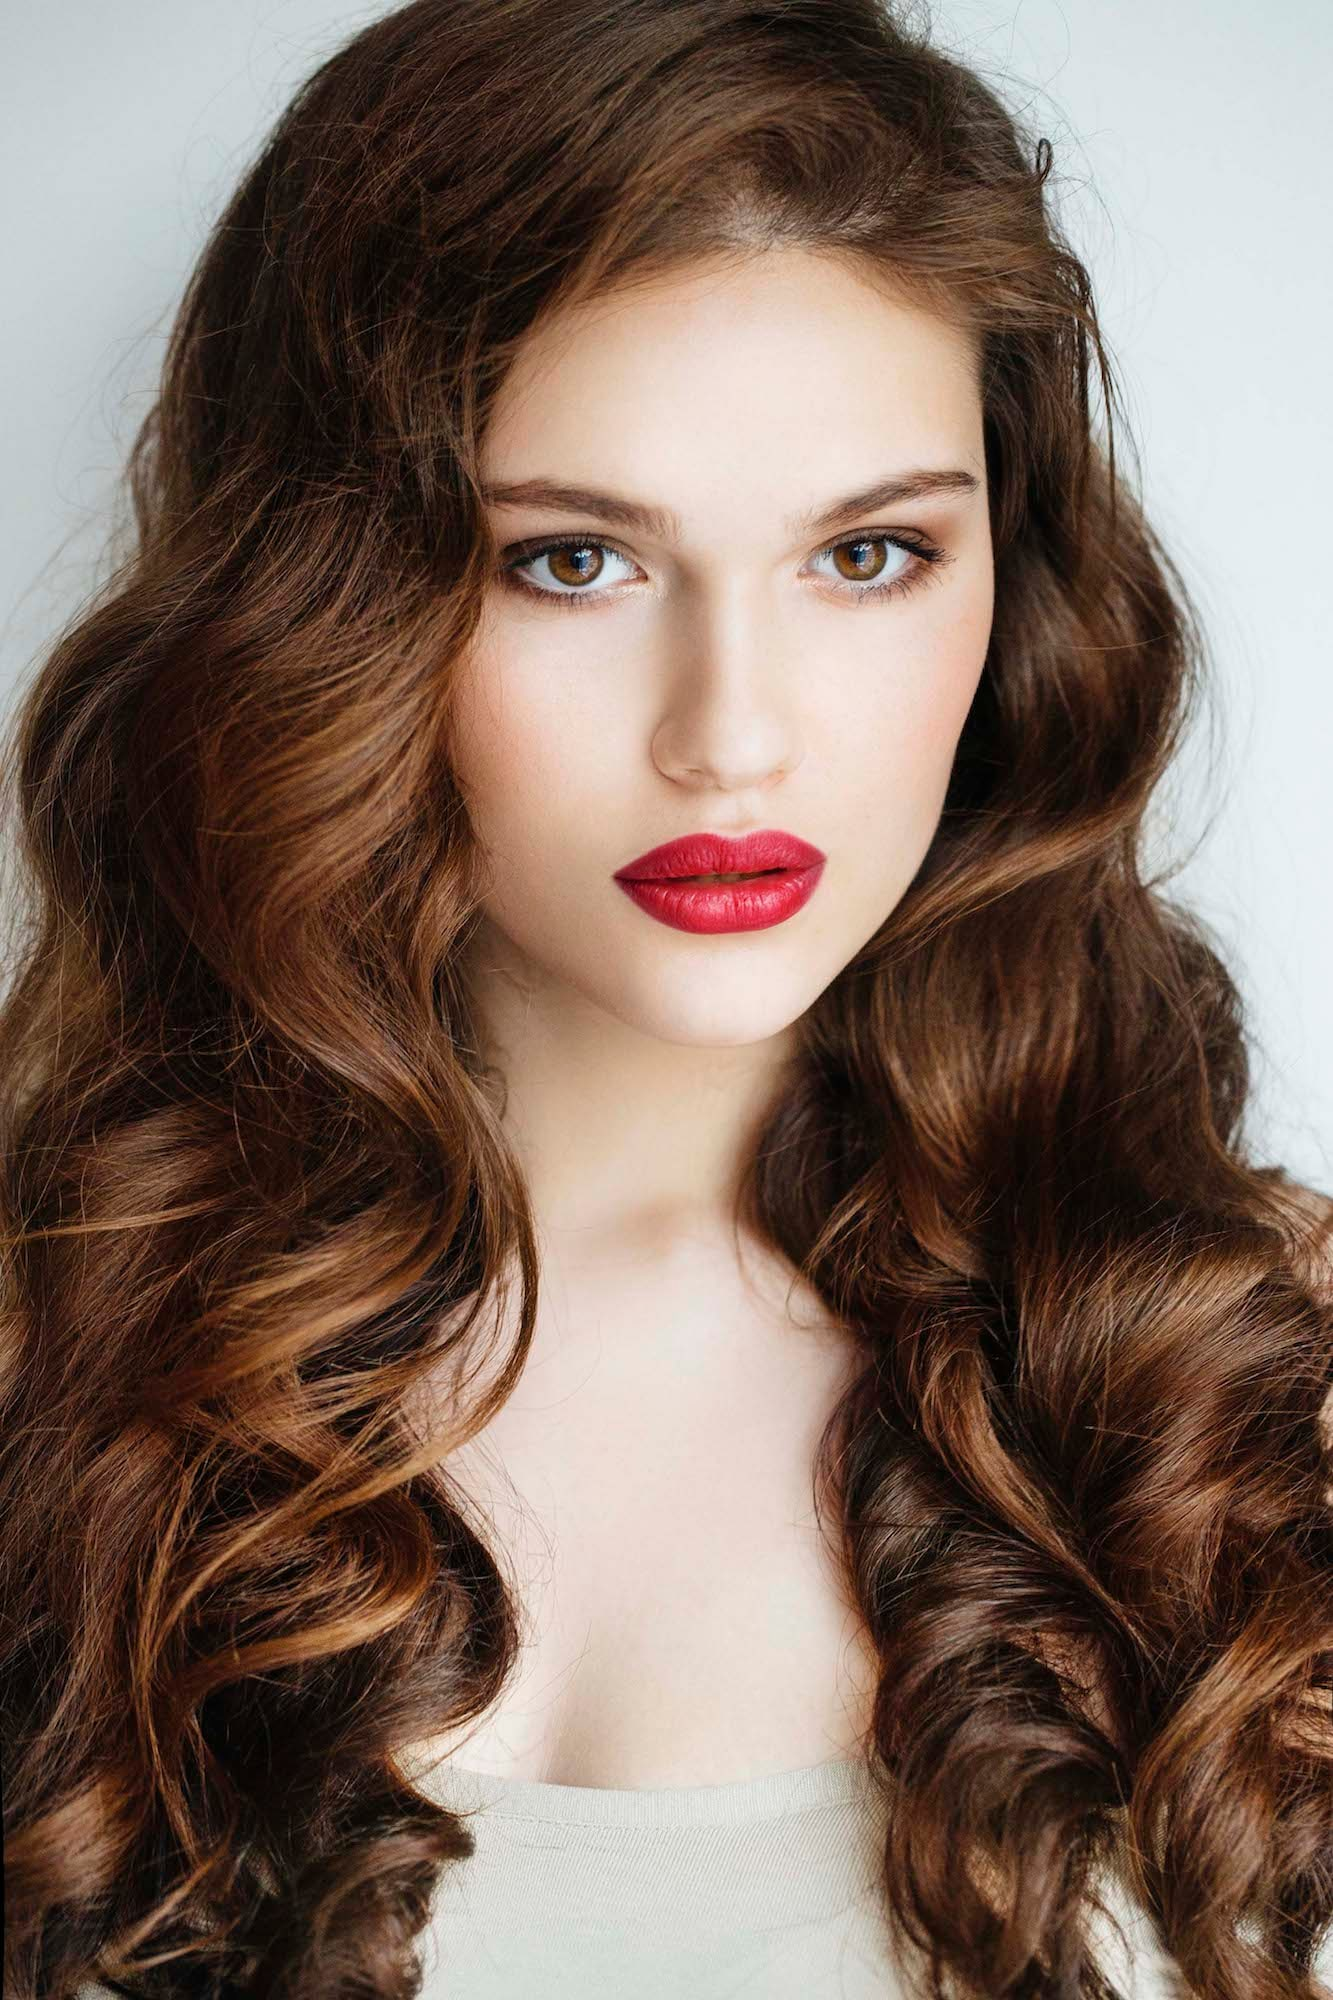 Warna rambut cokelat kemerahan dengan semburat warna merah.